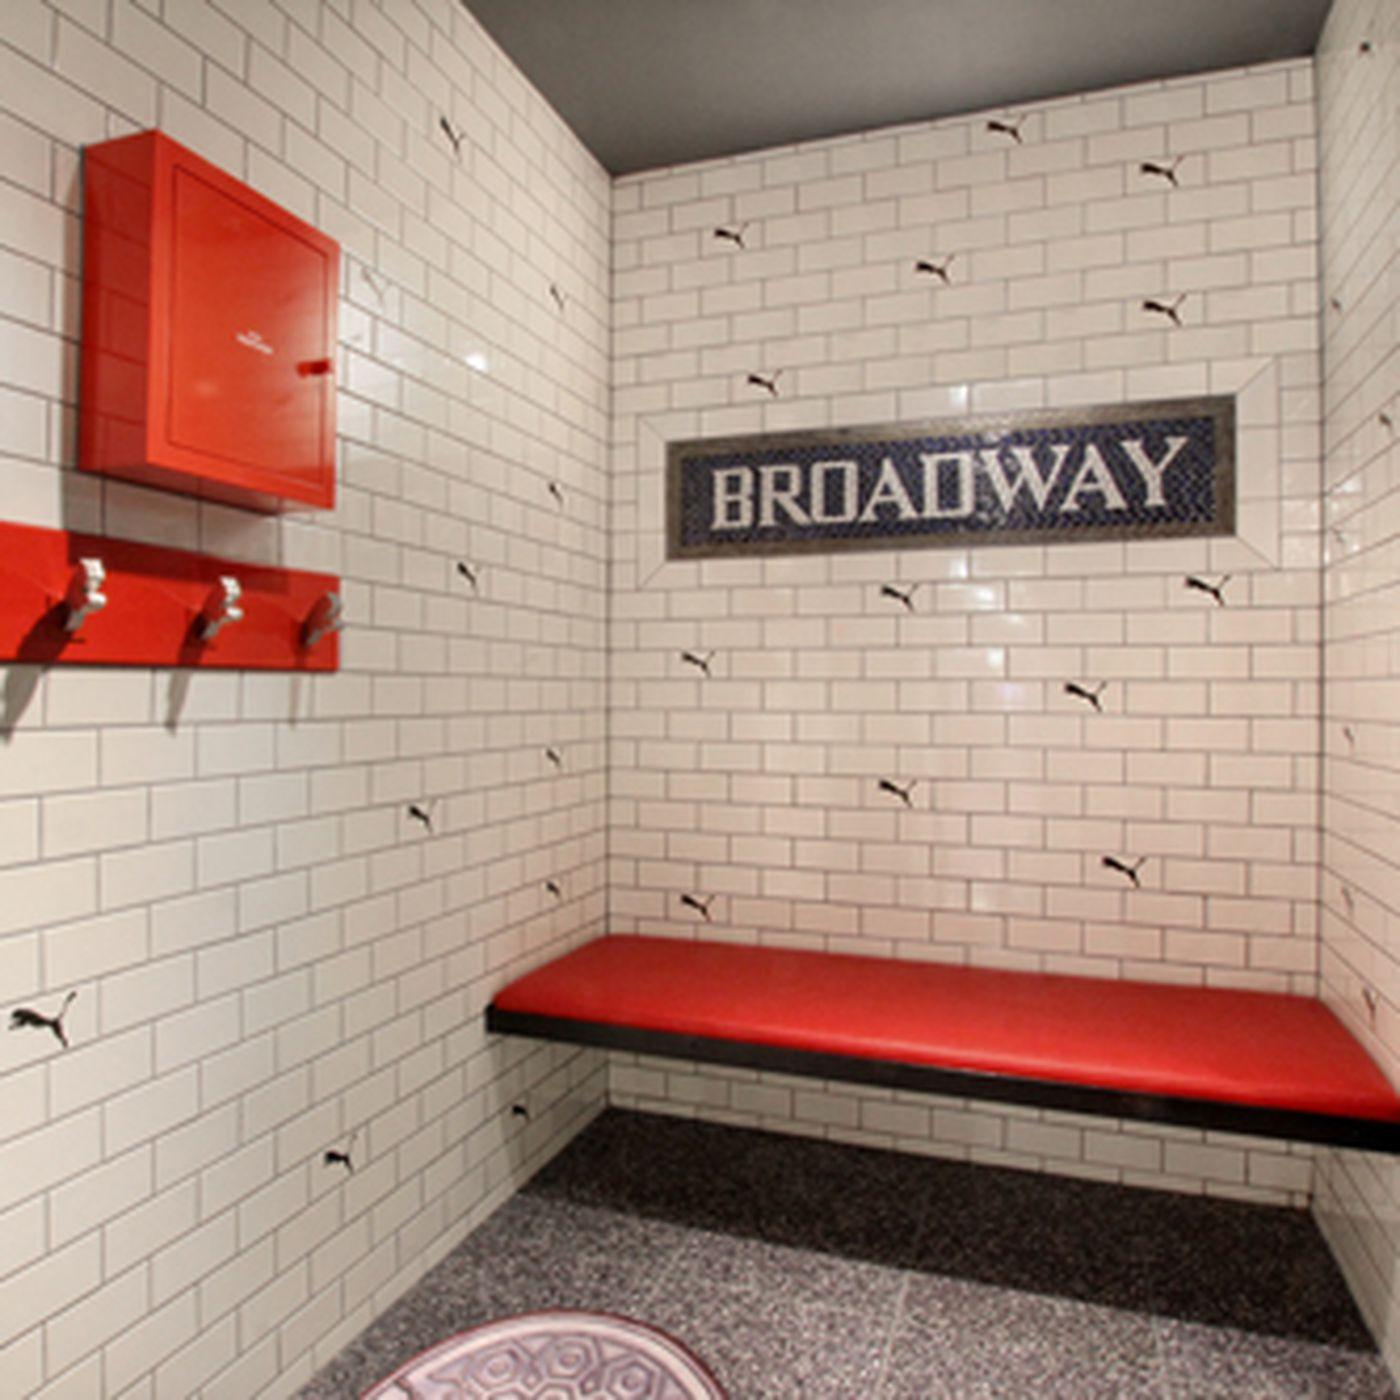 Puma Brings the Subway Above Ground and Into Its Soho Store - Racked NY 6c9b17c47385